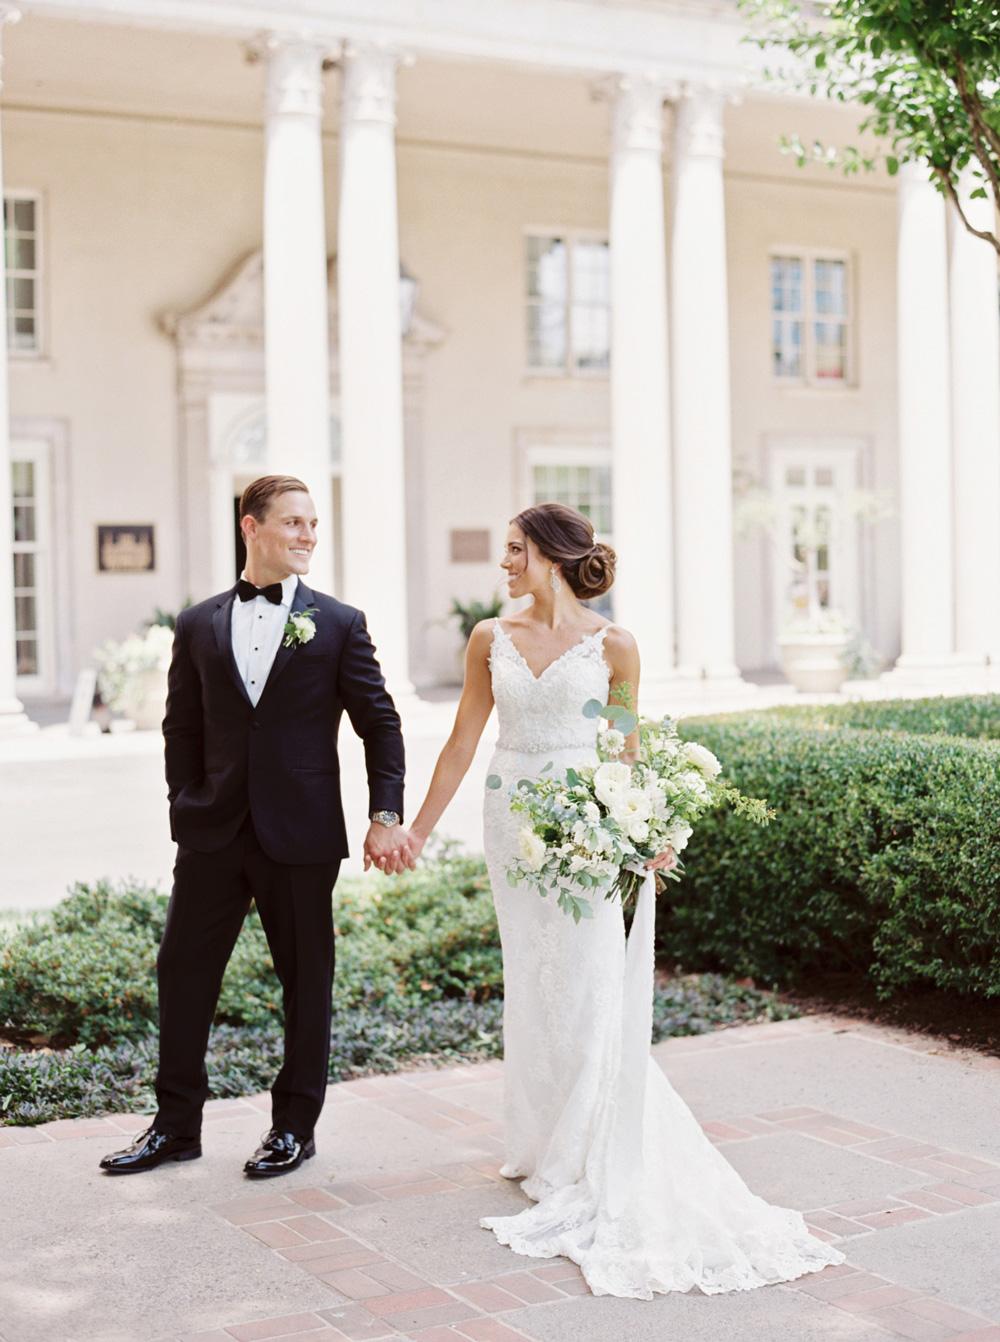 classic-elegant-wedding-photography-georgia-athomas.jpg